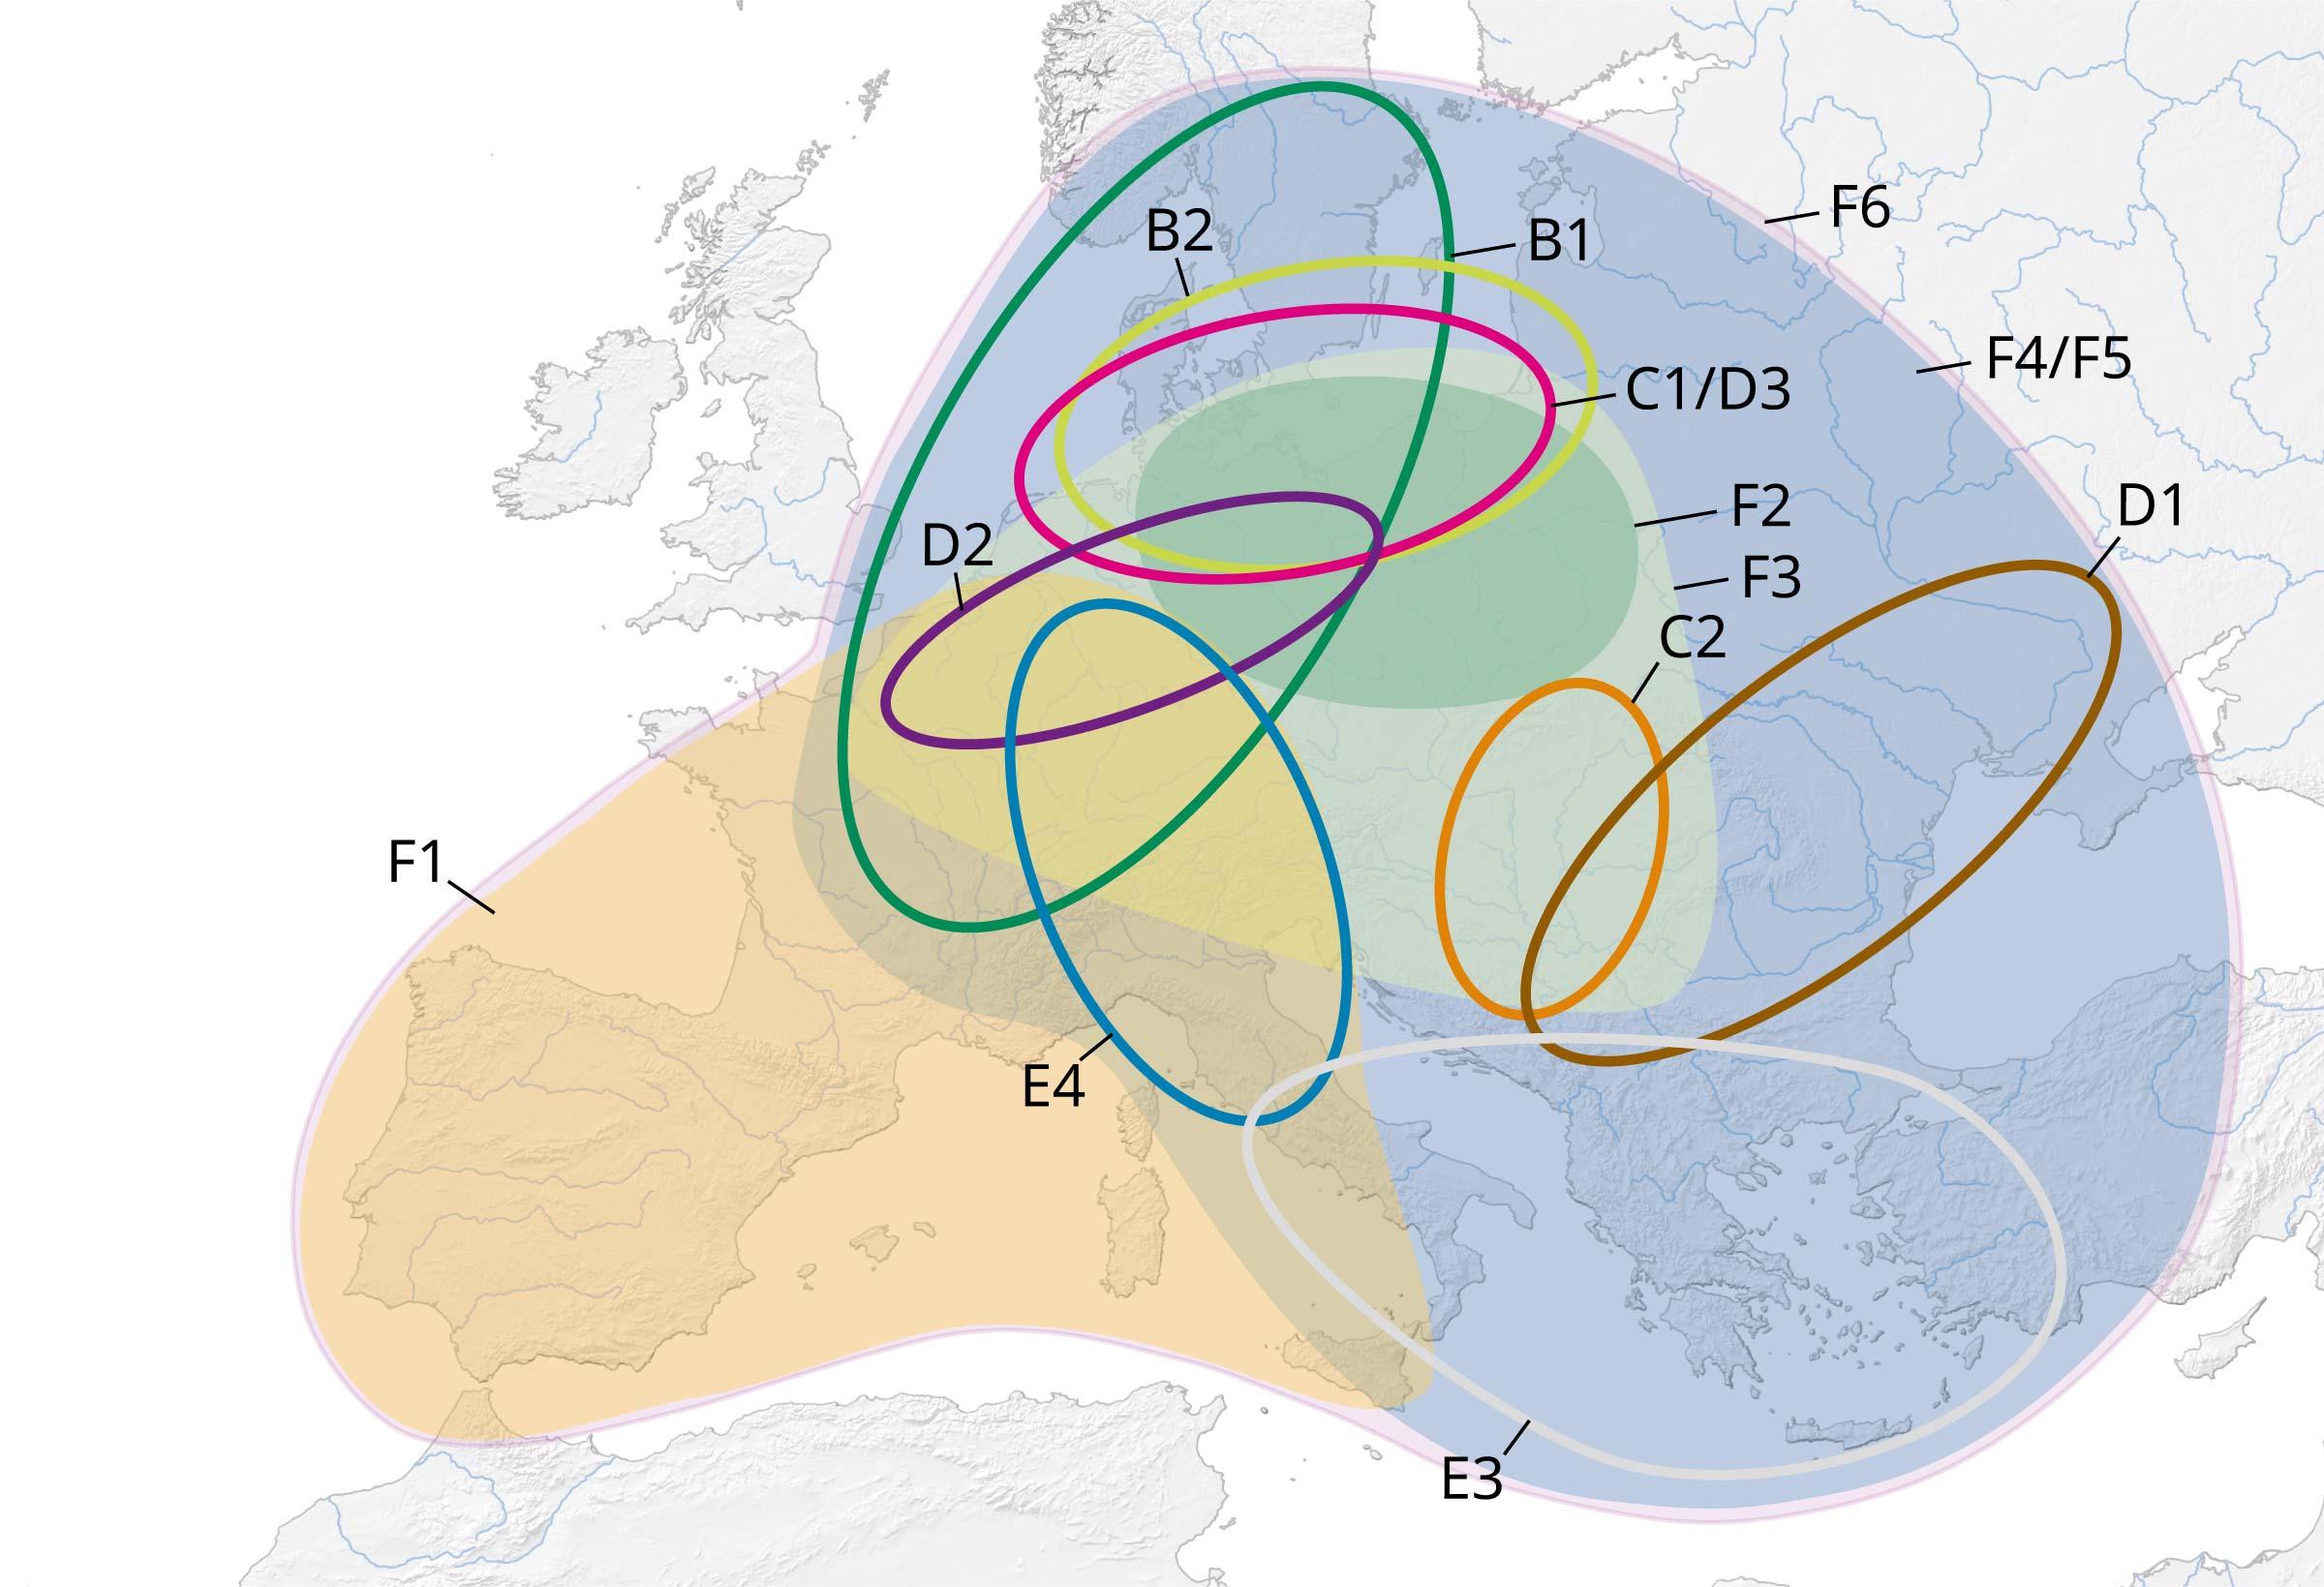 Map Interlinkage